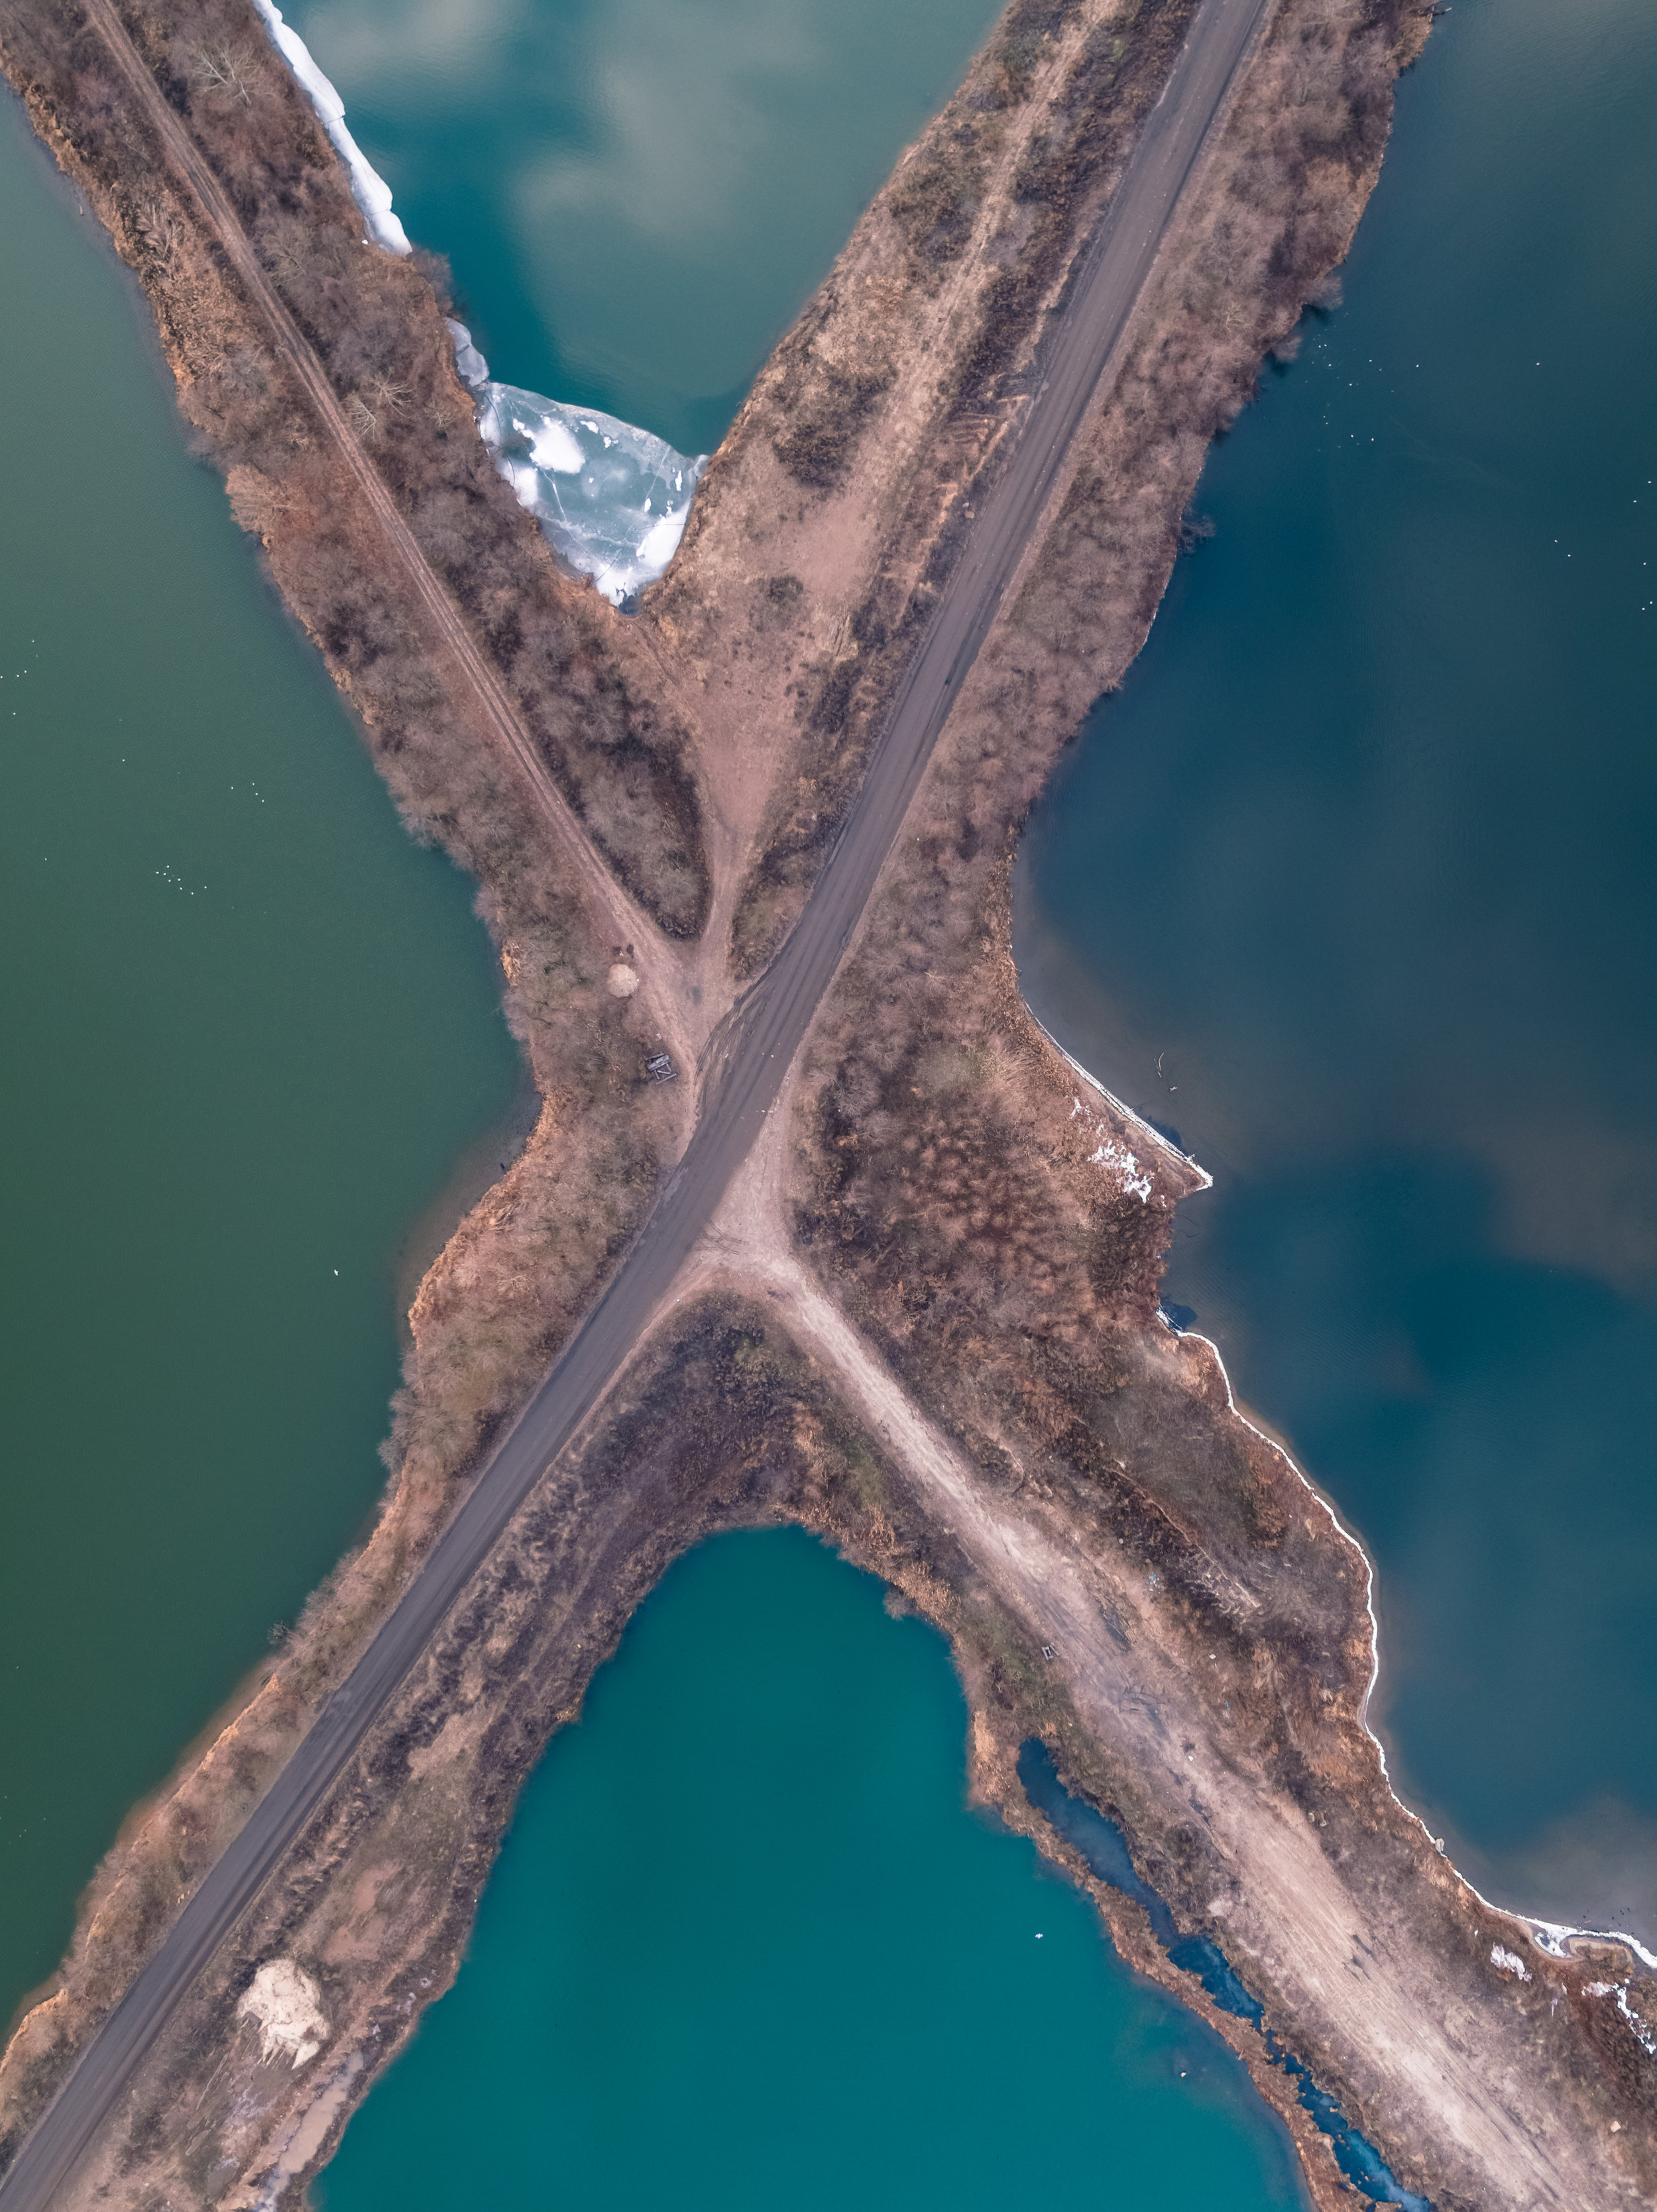 imperfection_typoland_aerial.jpg